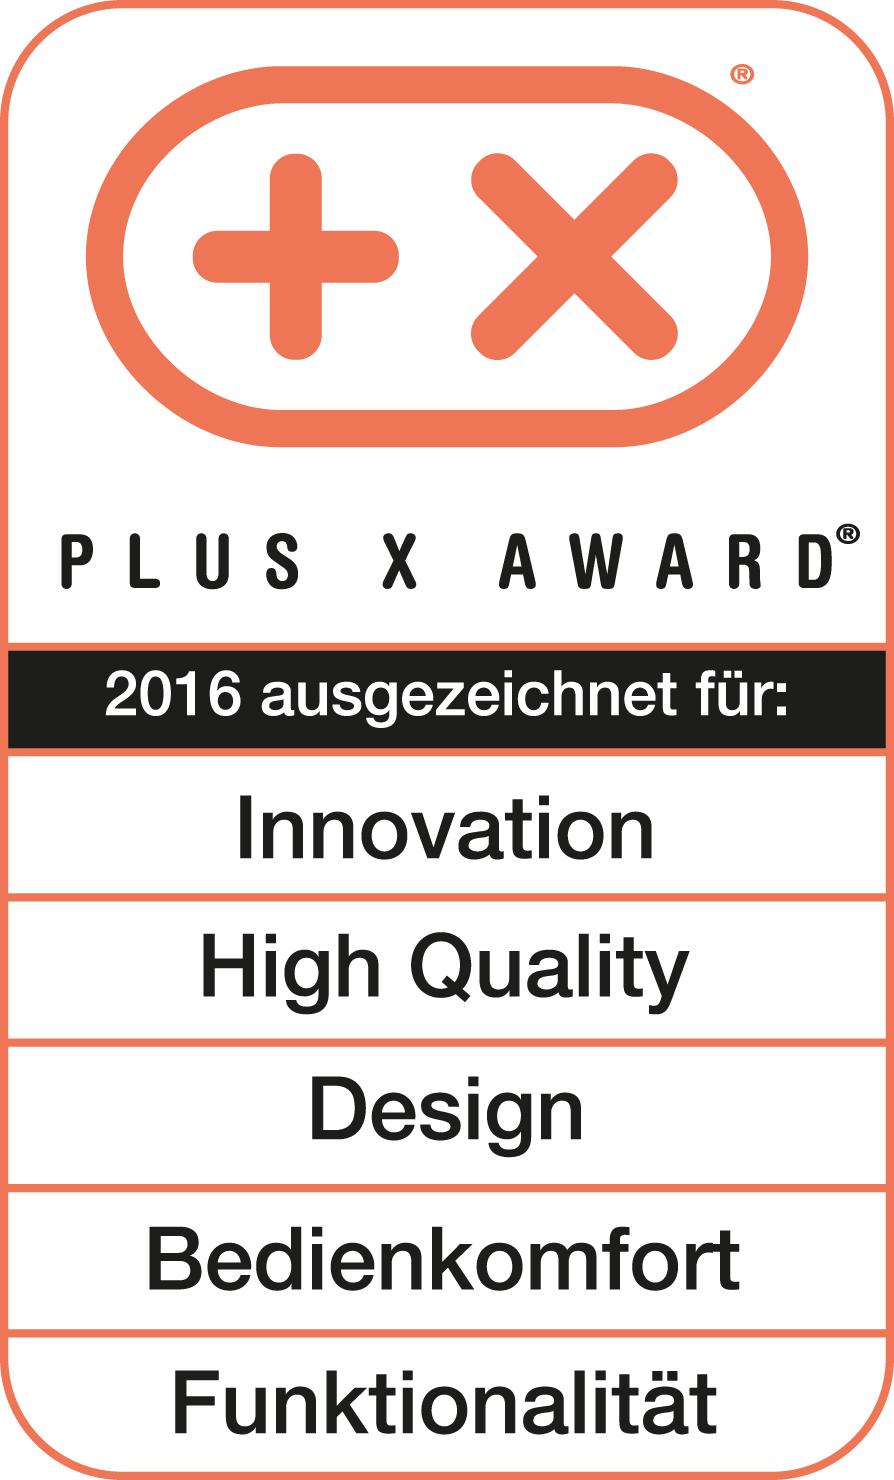 berbel-pxa-ihqdbf-de-pos-Designpreis_2__2047